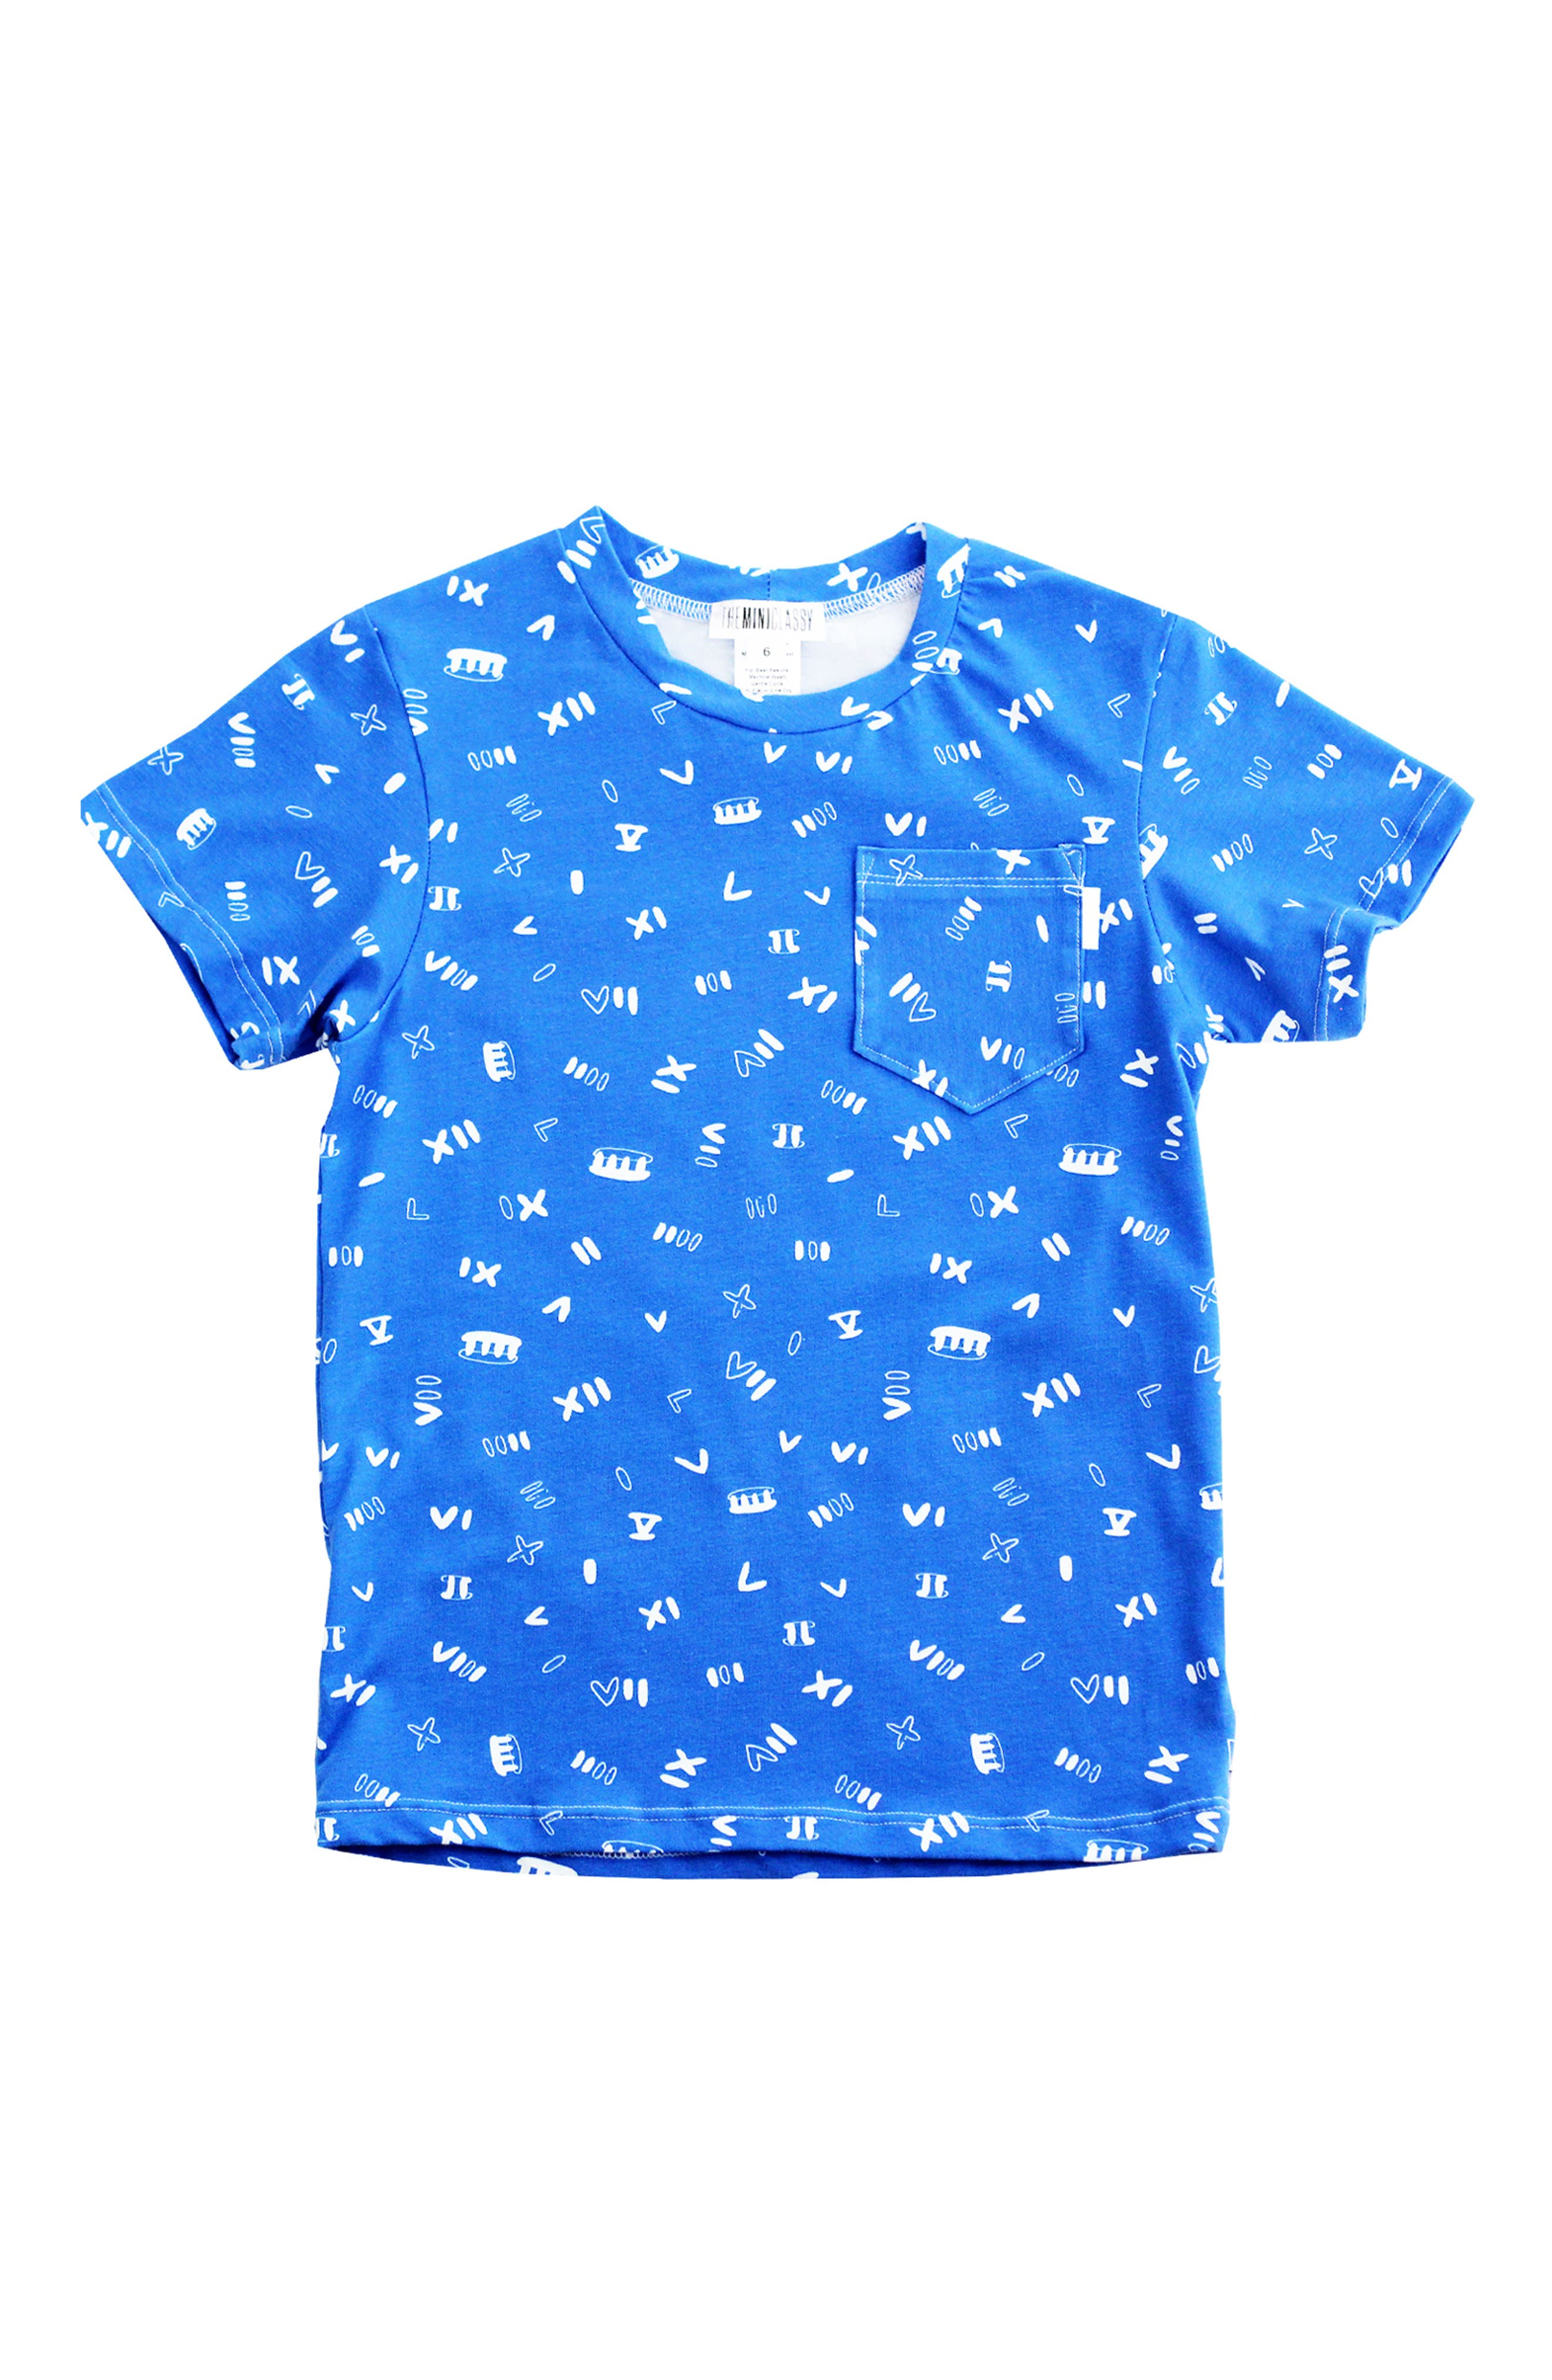 Main Image - theMINIclassy Roman Noodle Print Pocket T-Shirt (Toddler Boys & Little Boys)